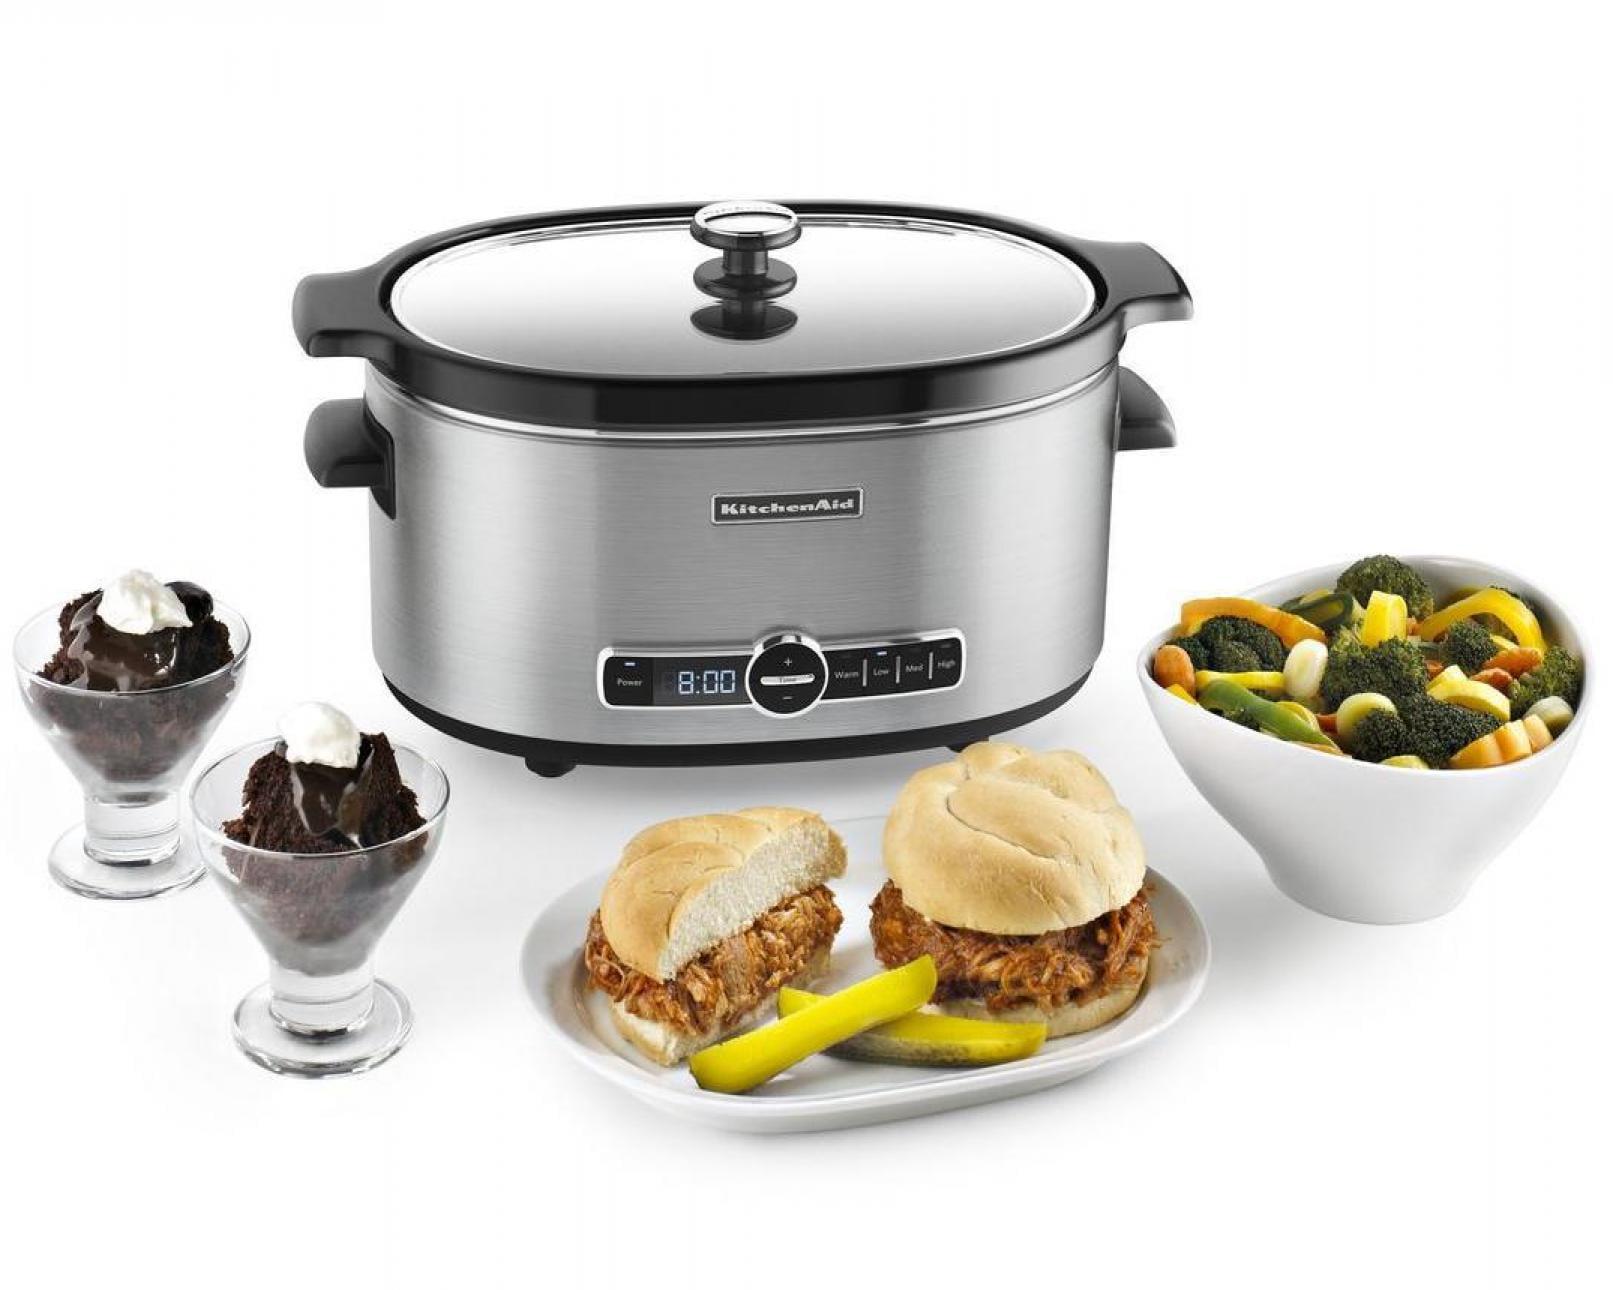 kitchenaid繧箘 6 quart slow cooker with solid glass lid walmart